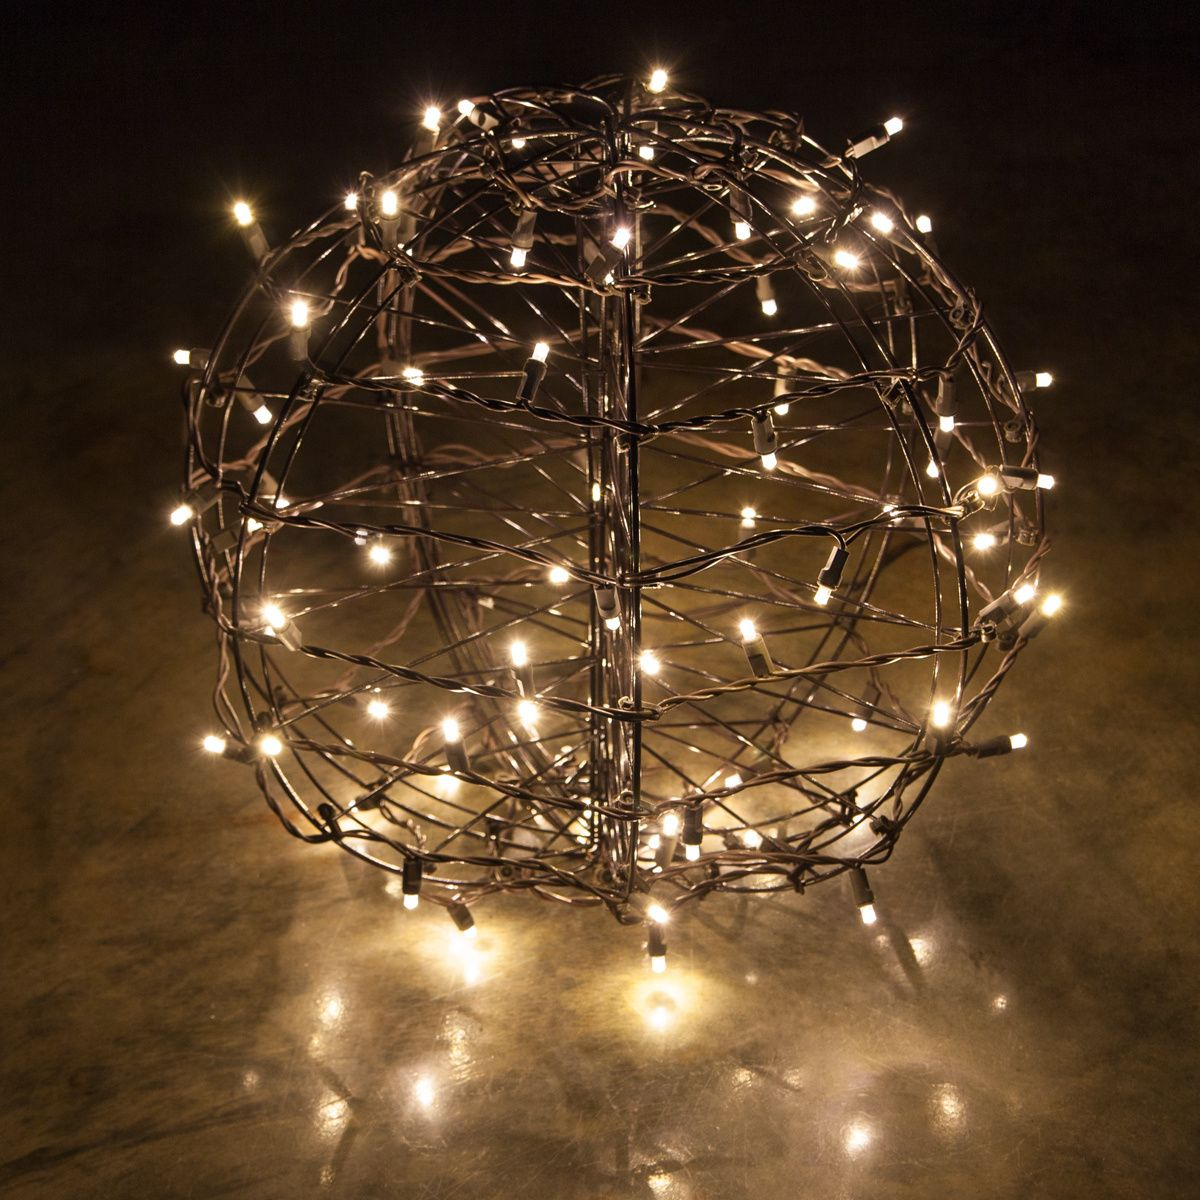 Warm White LED Christmas Light Ball, Fold Flat Brown Frame